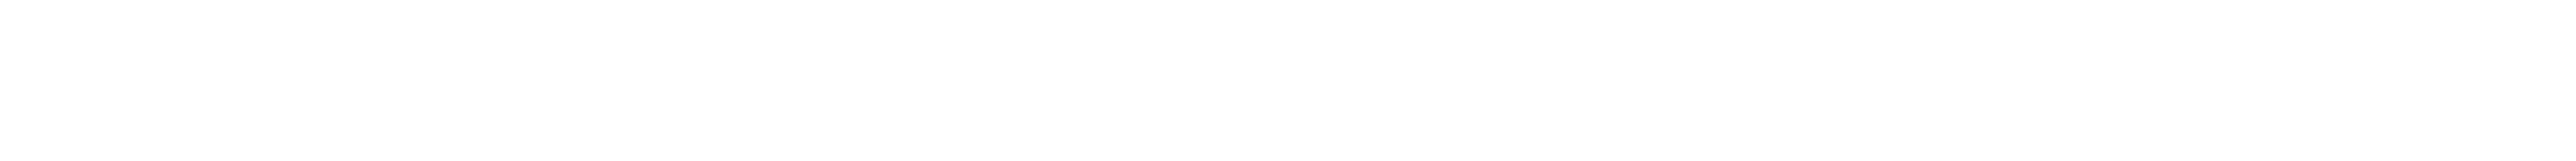 wave-white-short